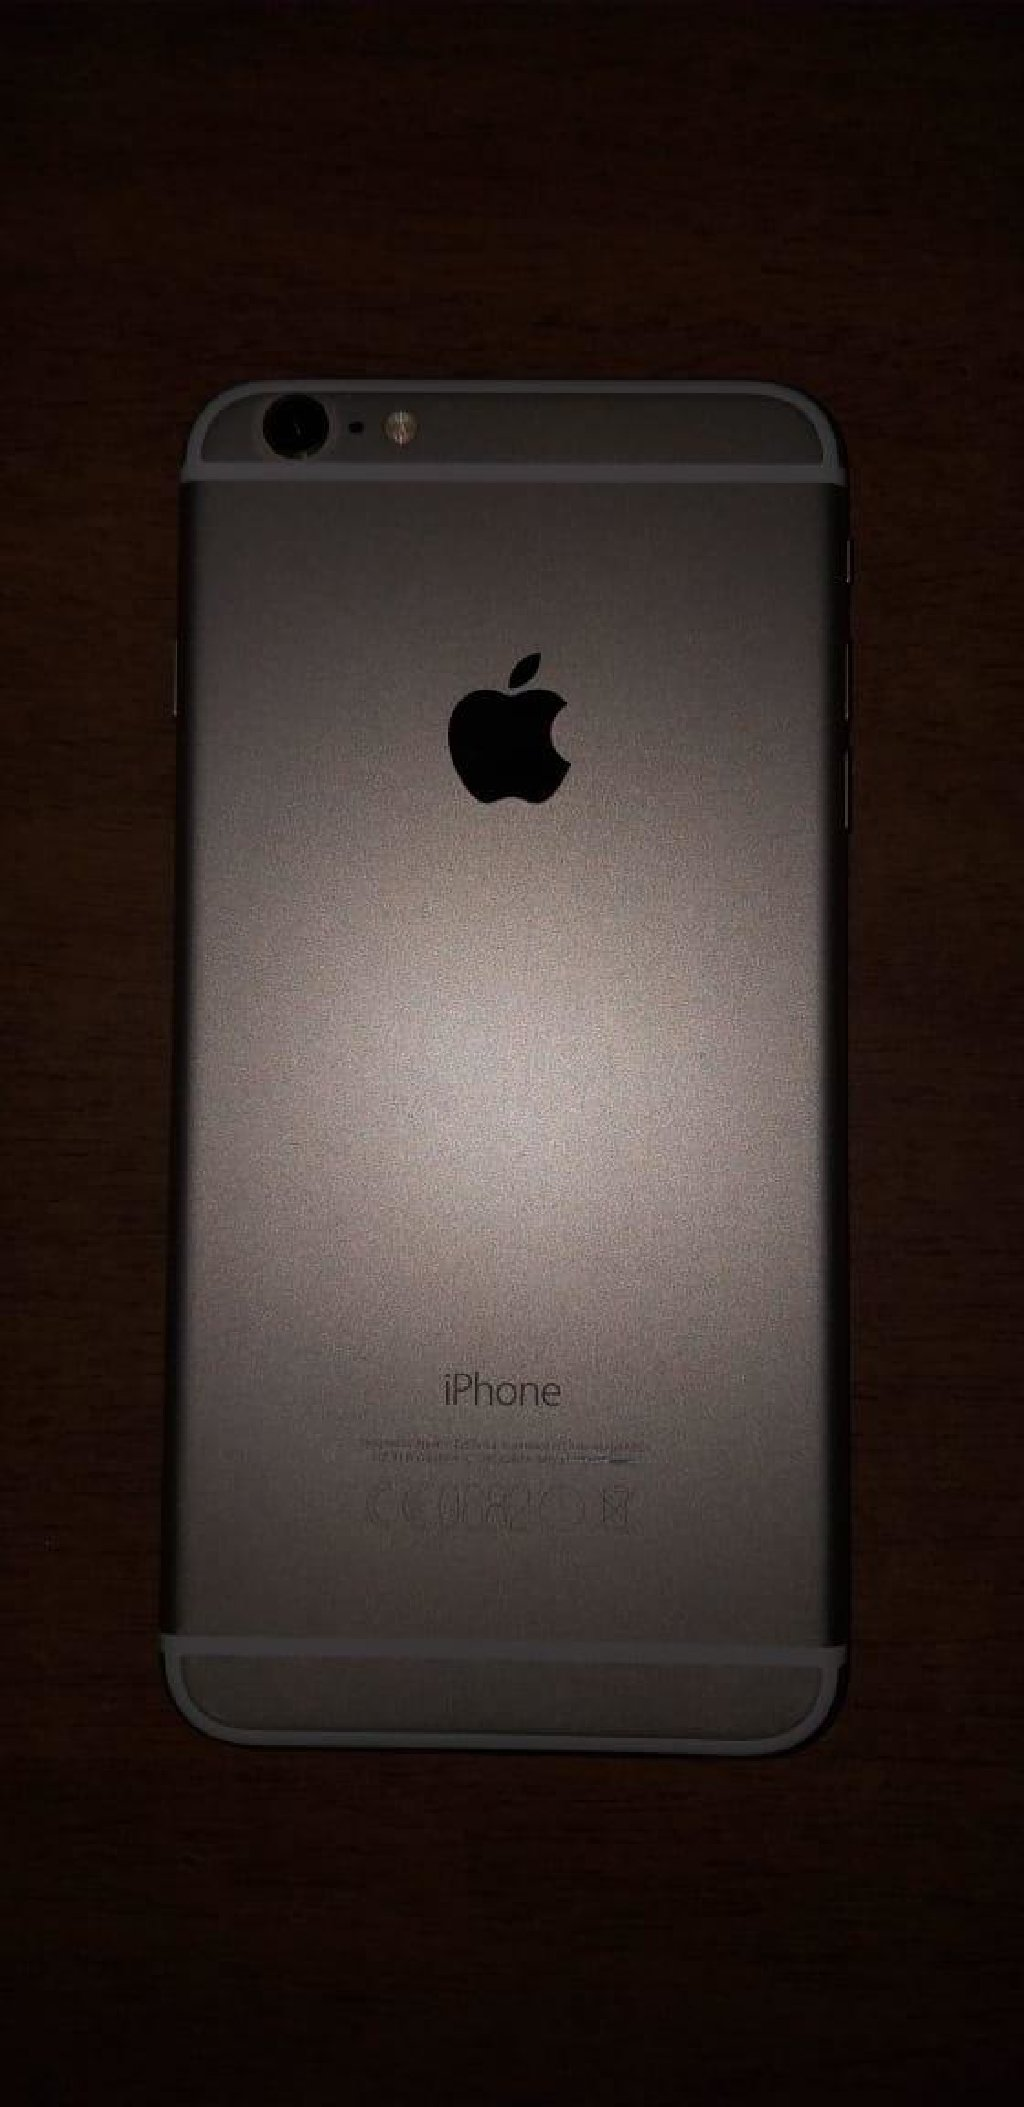 Iphone 6 plus satilir plata yanib